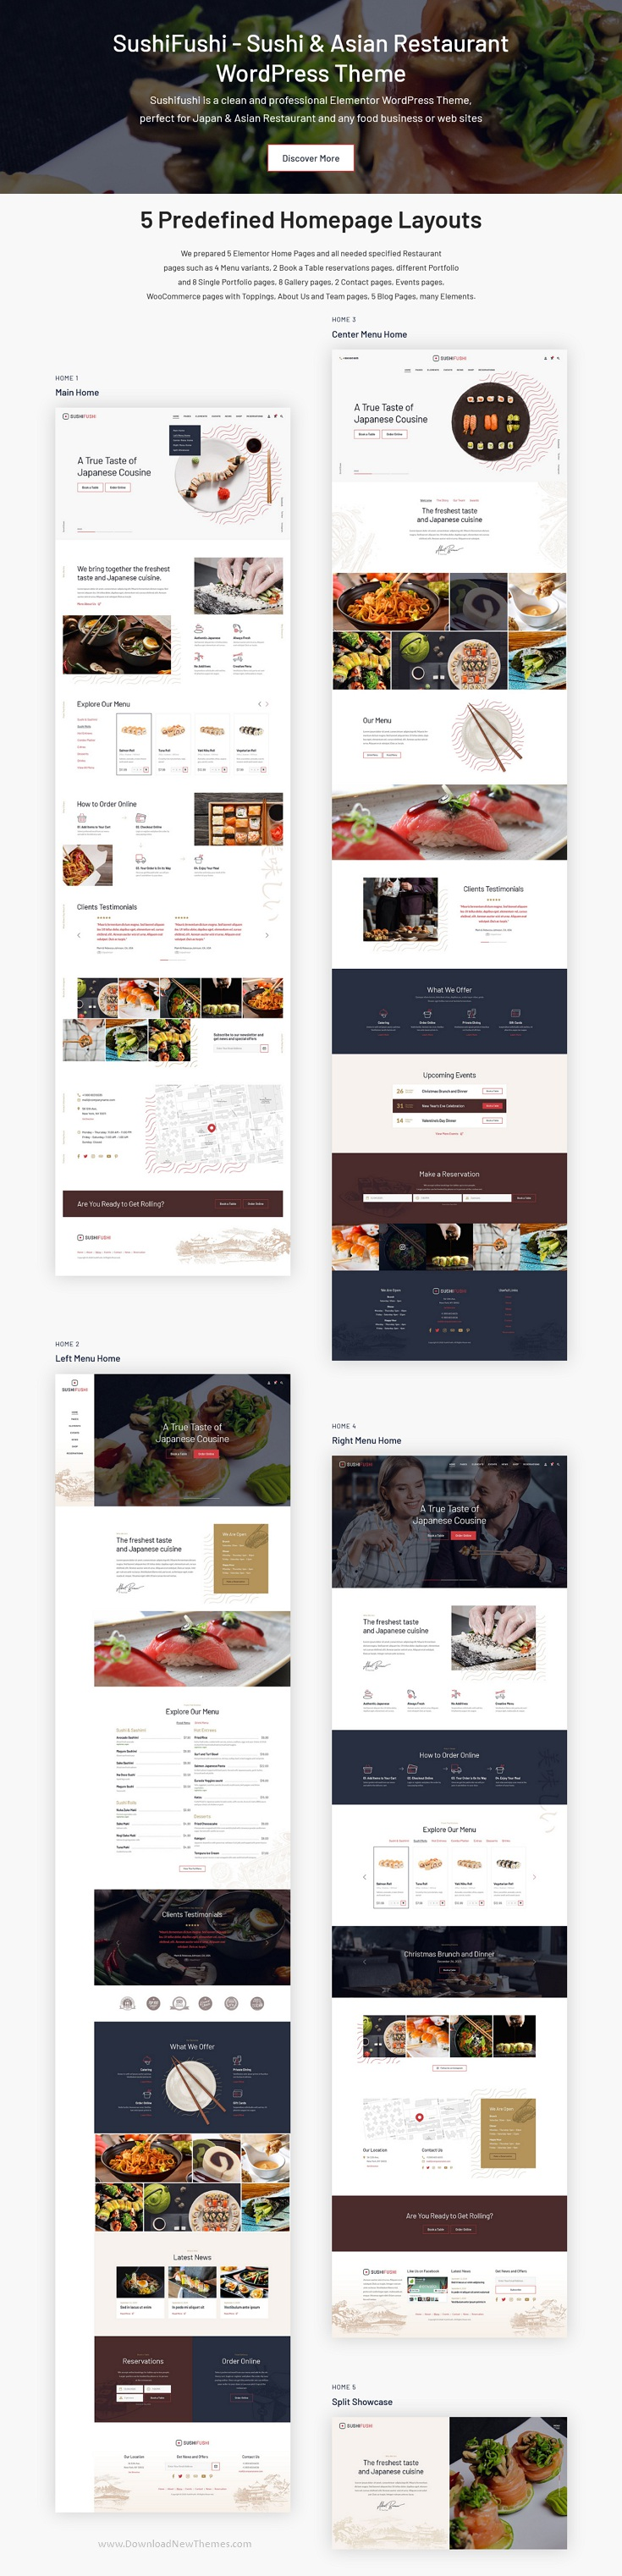 Sushi, Japanese Food & Asian Restaurant WordPress Theme